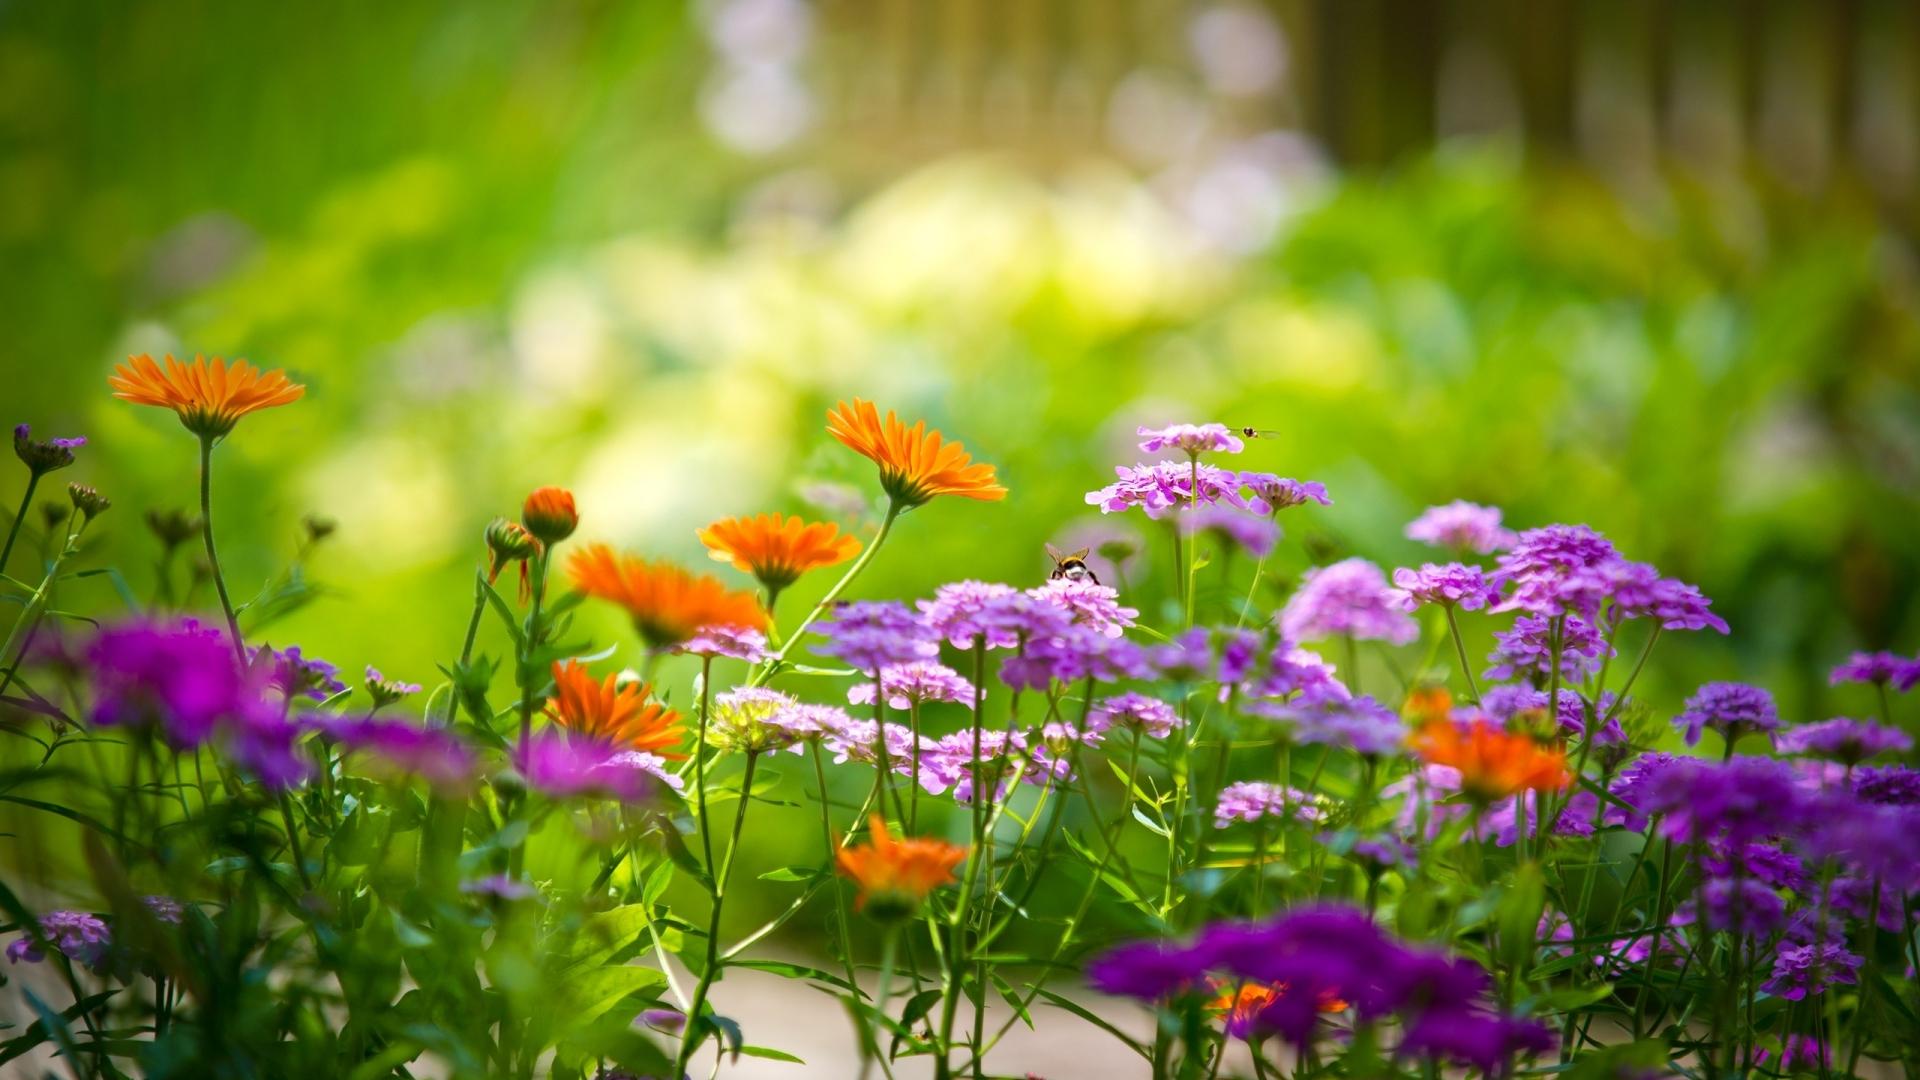 Pequeñas flores - 1920x1080